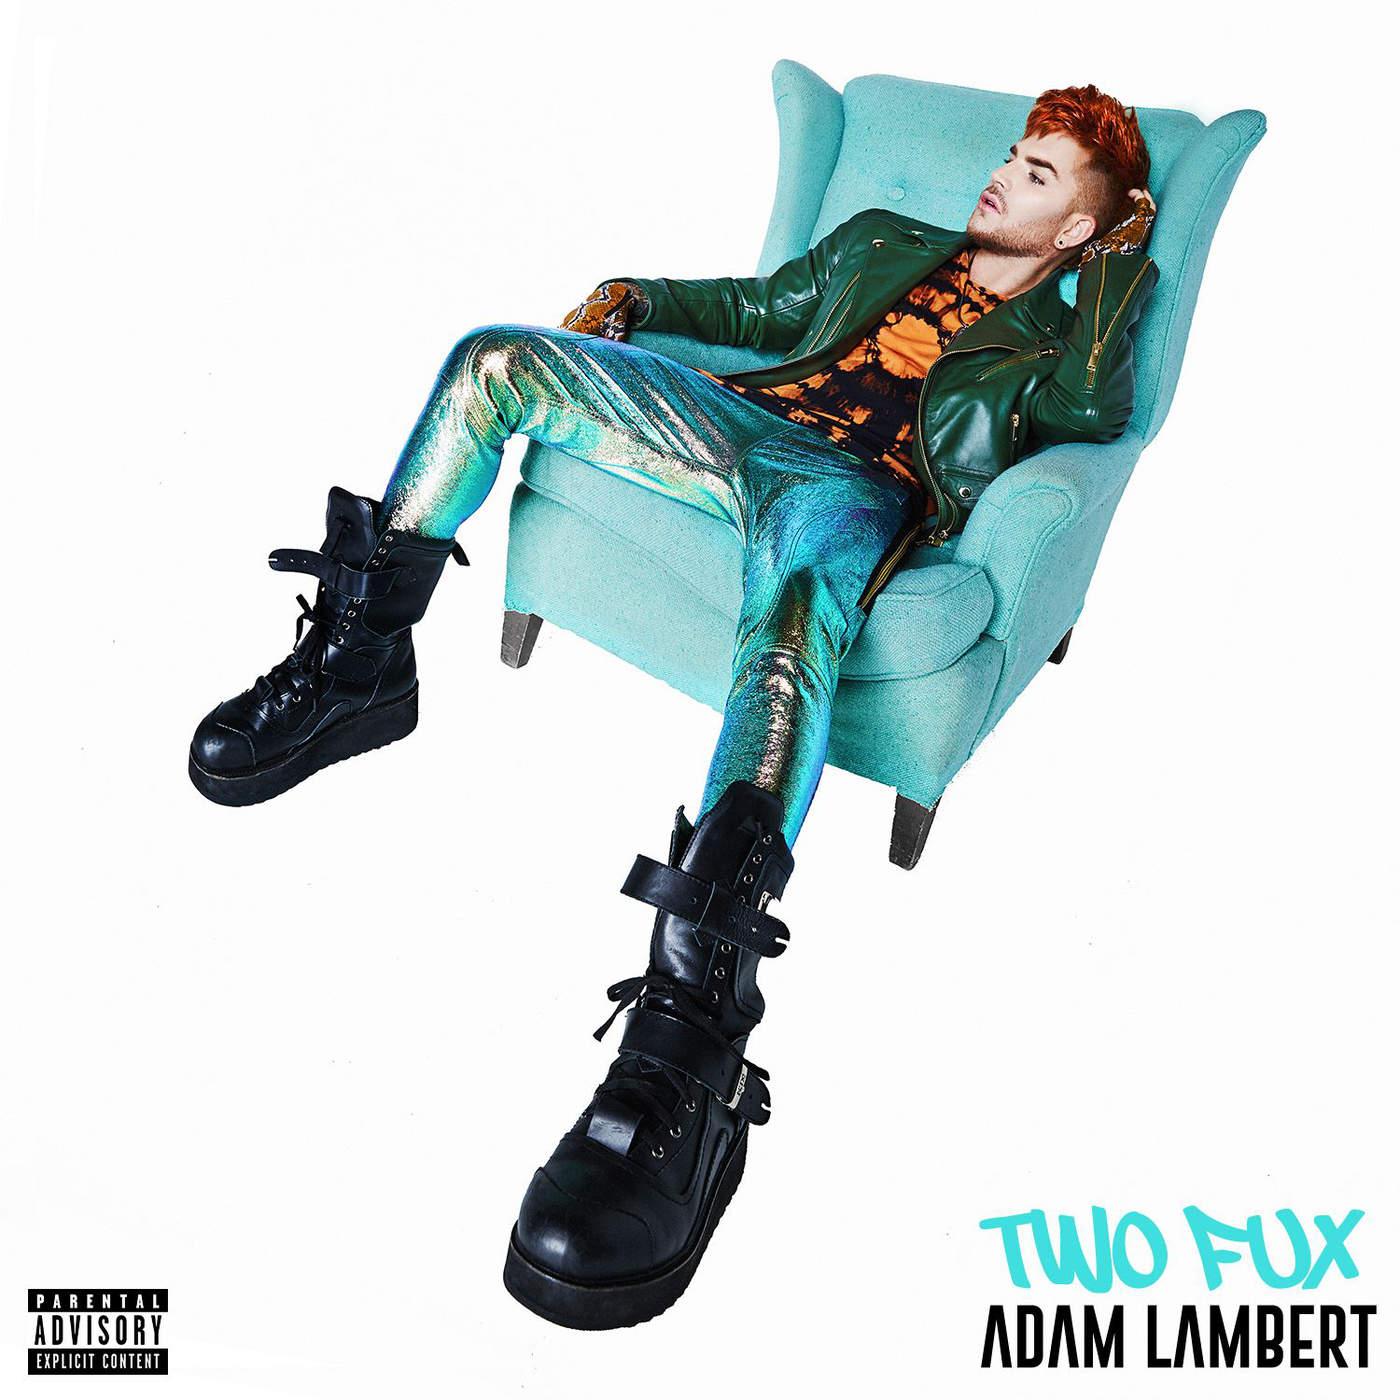 Adam Lambert - Two Fux - Single Cover